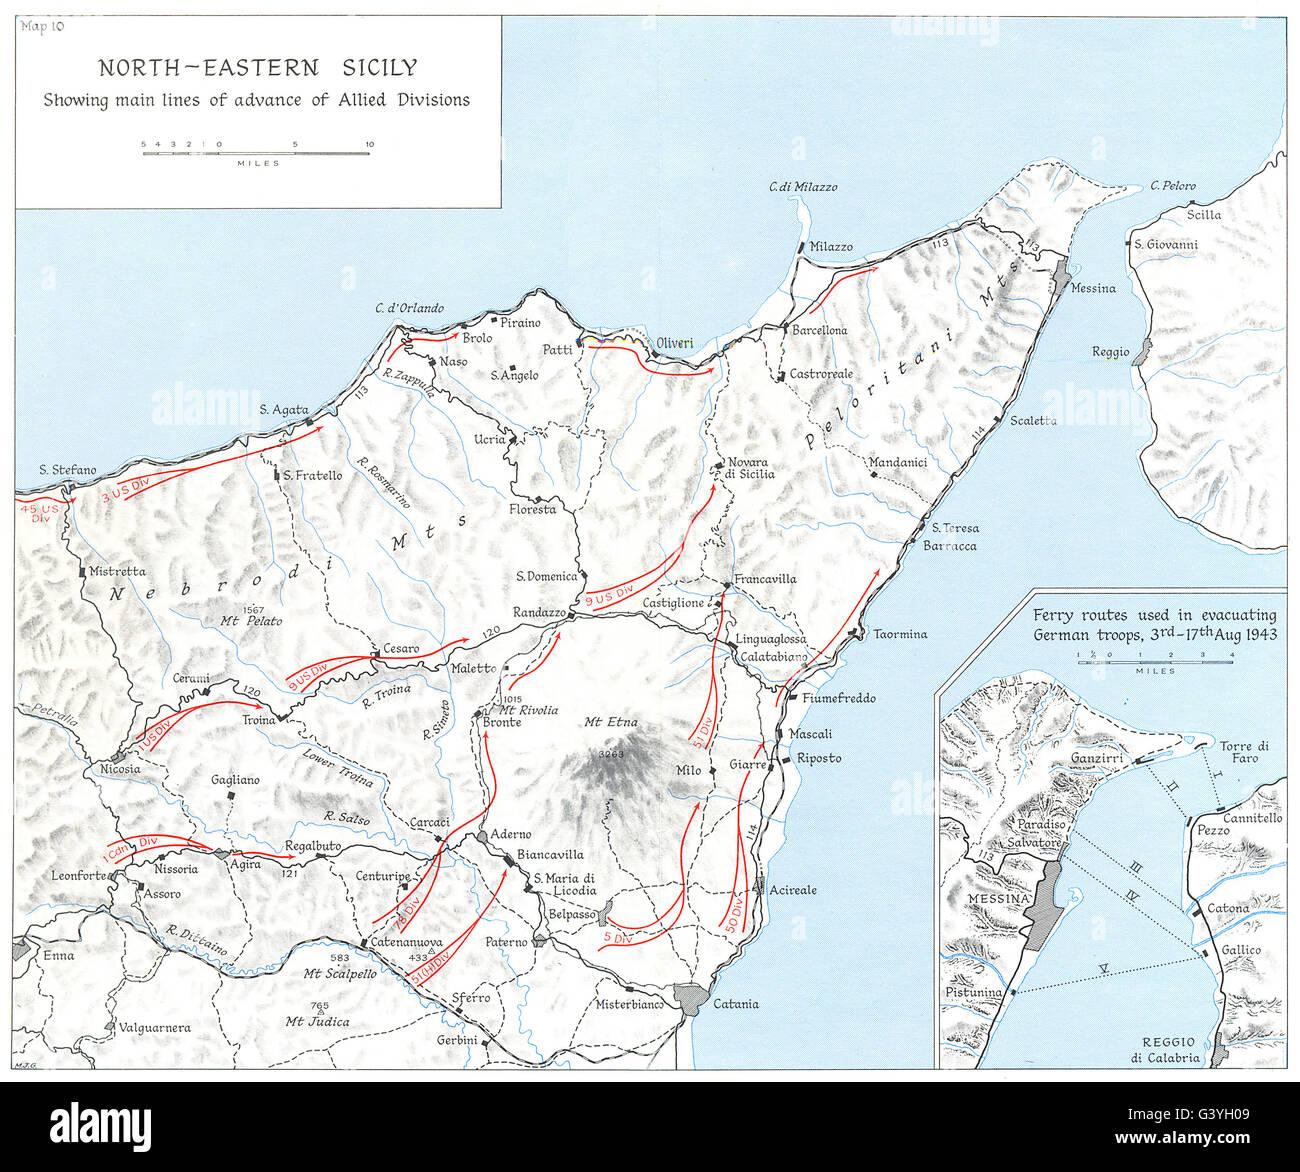 Sizilien Karte ätna.Sizilien Alliierten ätna Juli August 1943 Fähre Routen